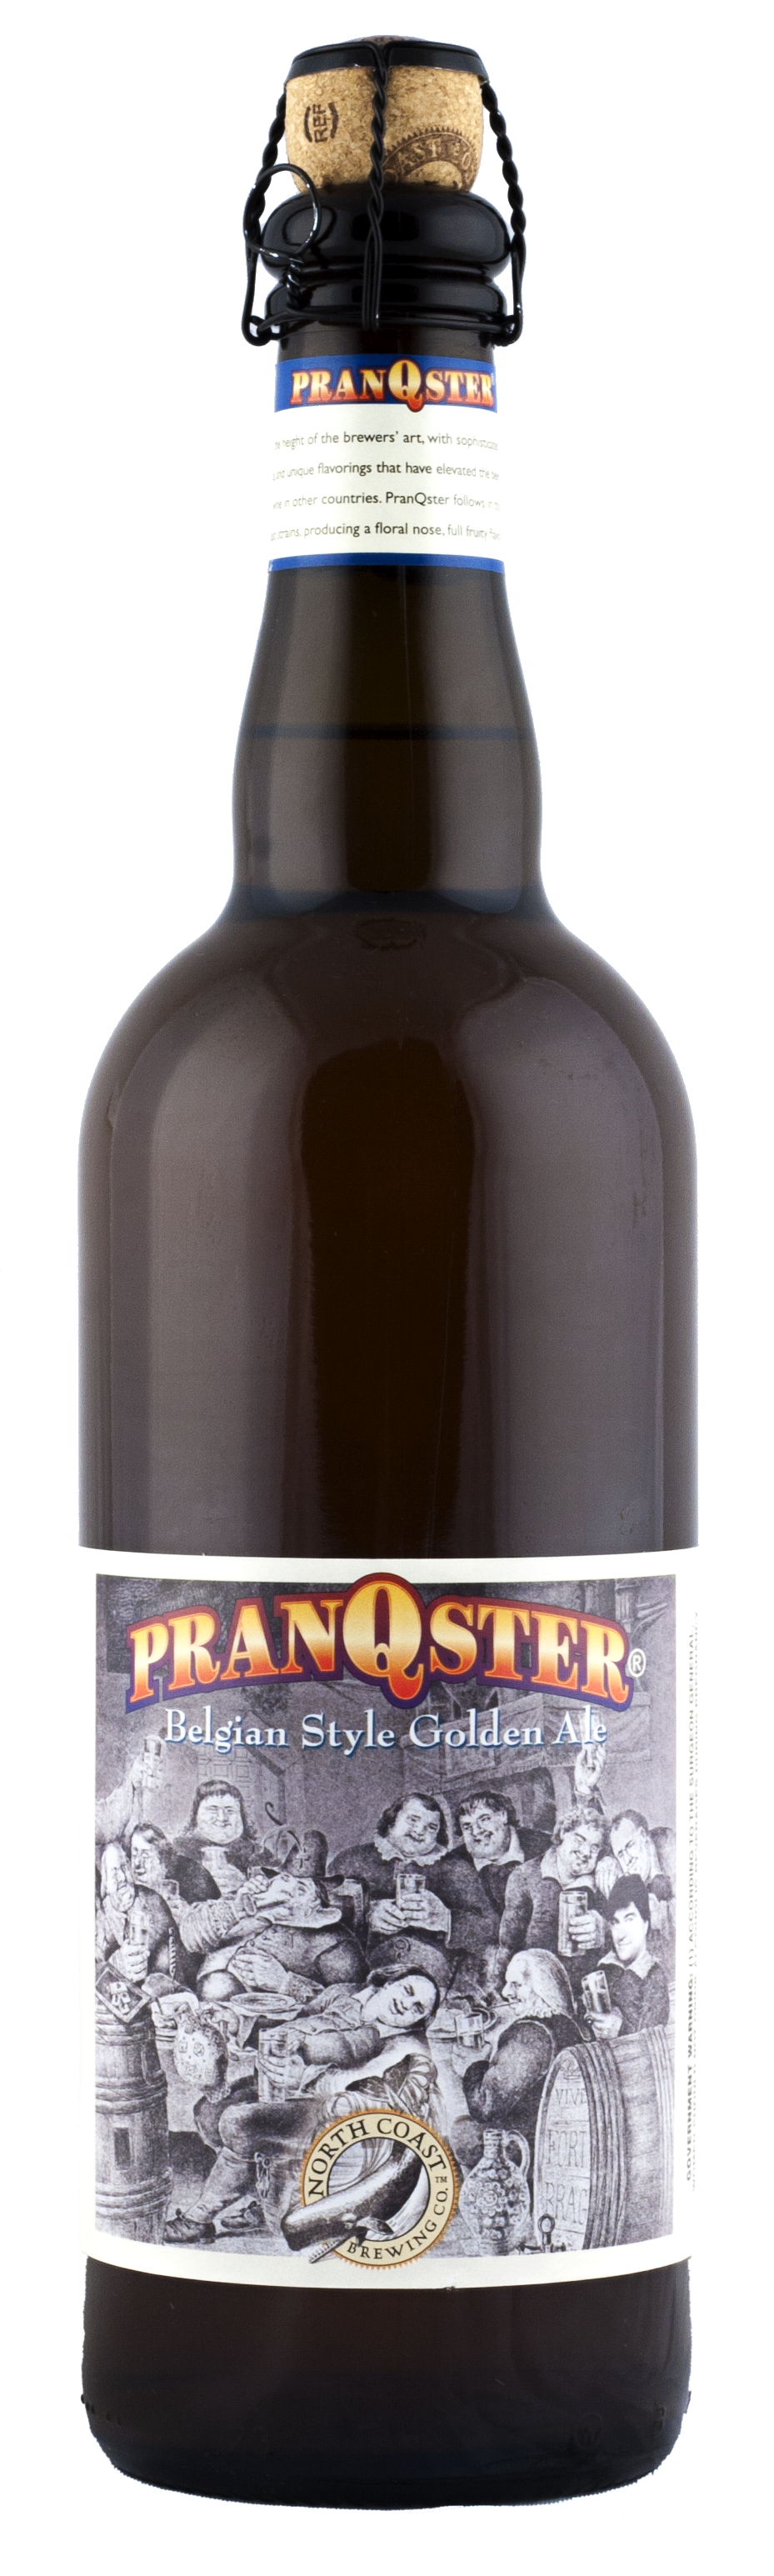 North Coast Pranqster Belgian Style Golden Ale